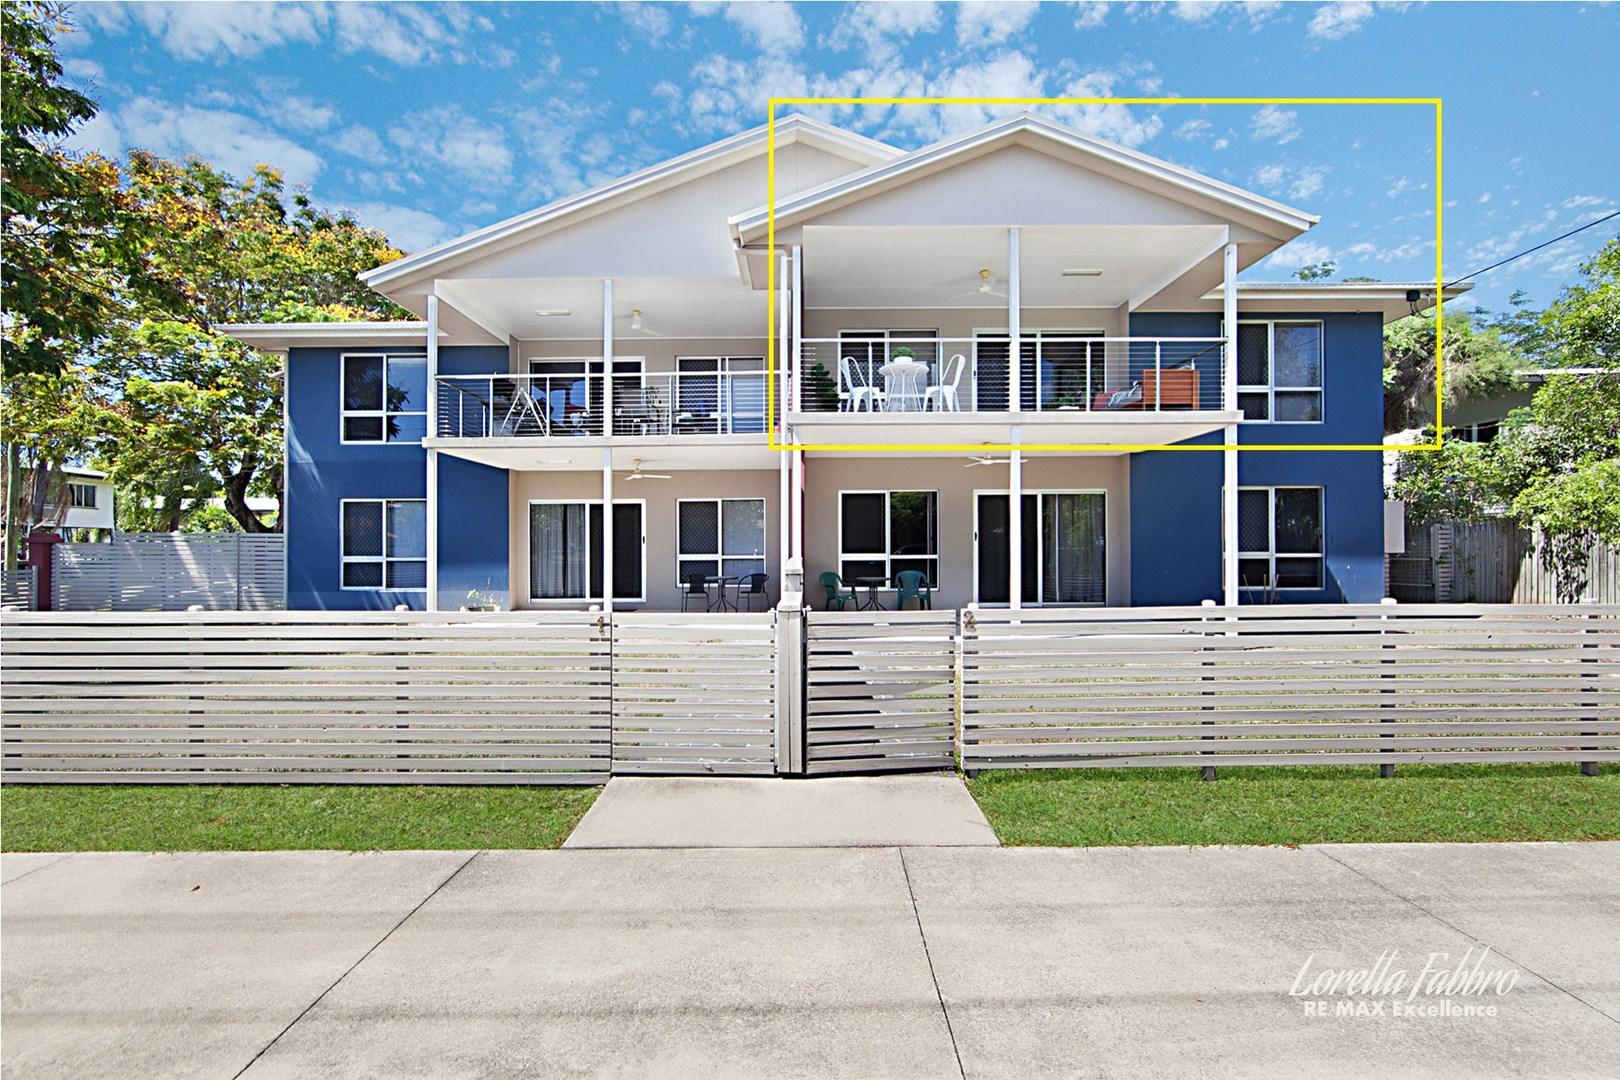 4/89 Burt Street, Aitkenvale QLD 4814, Image 0